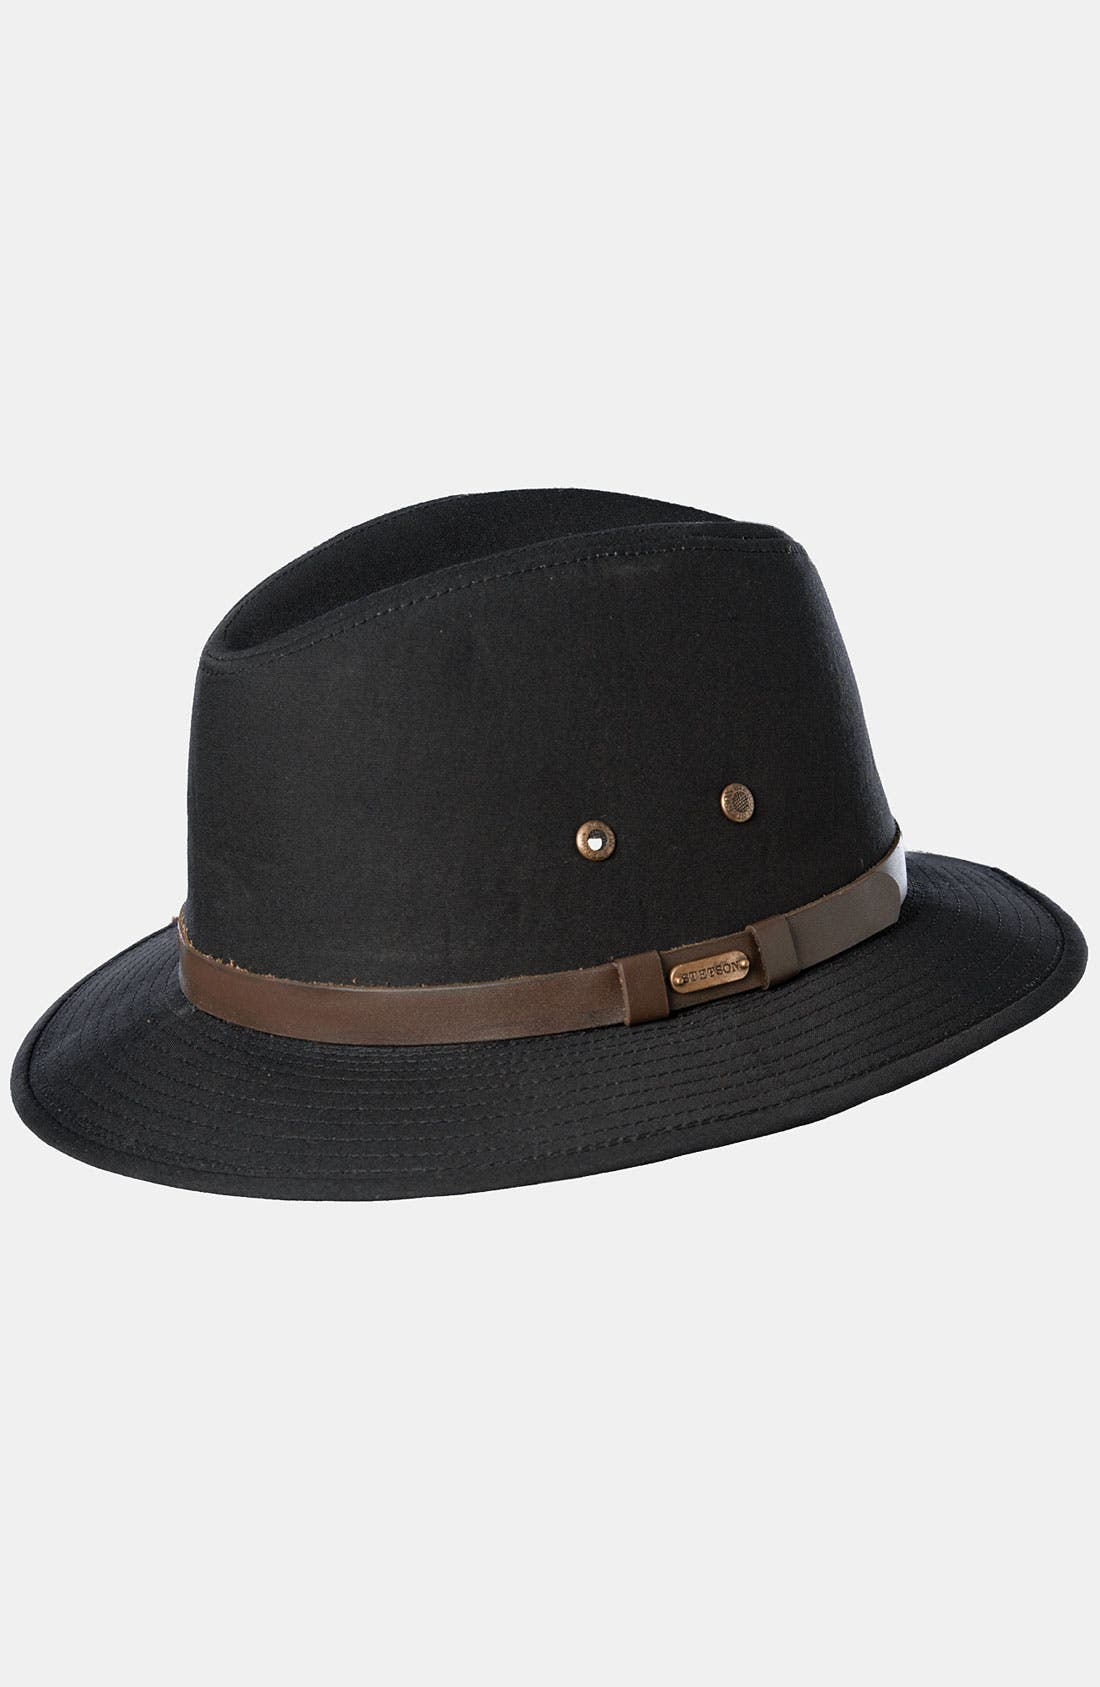 Alternate Image 1 Selected - Stetson Water Repellent Safari Hat